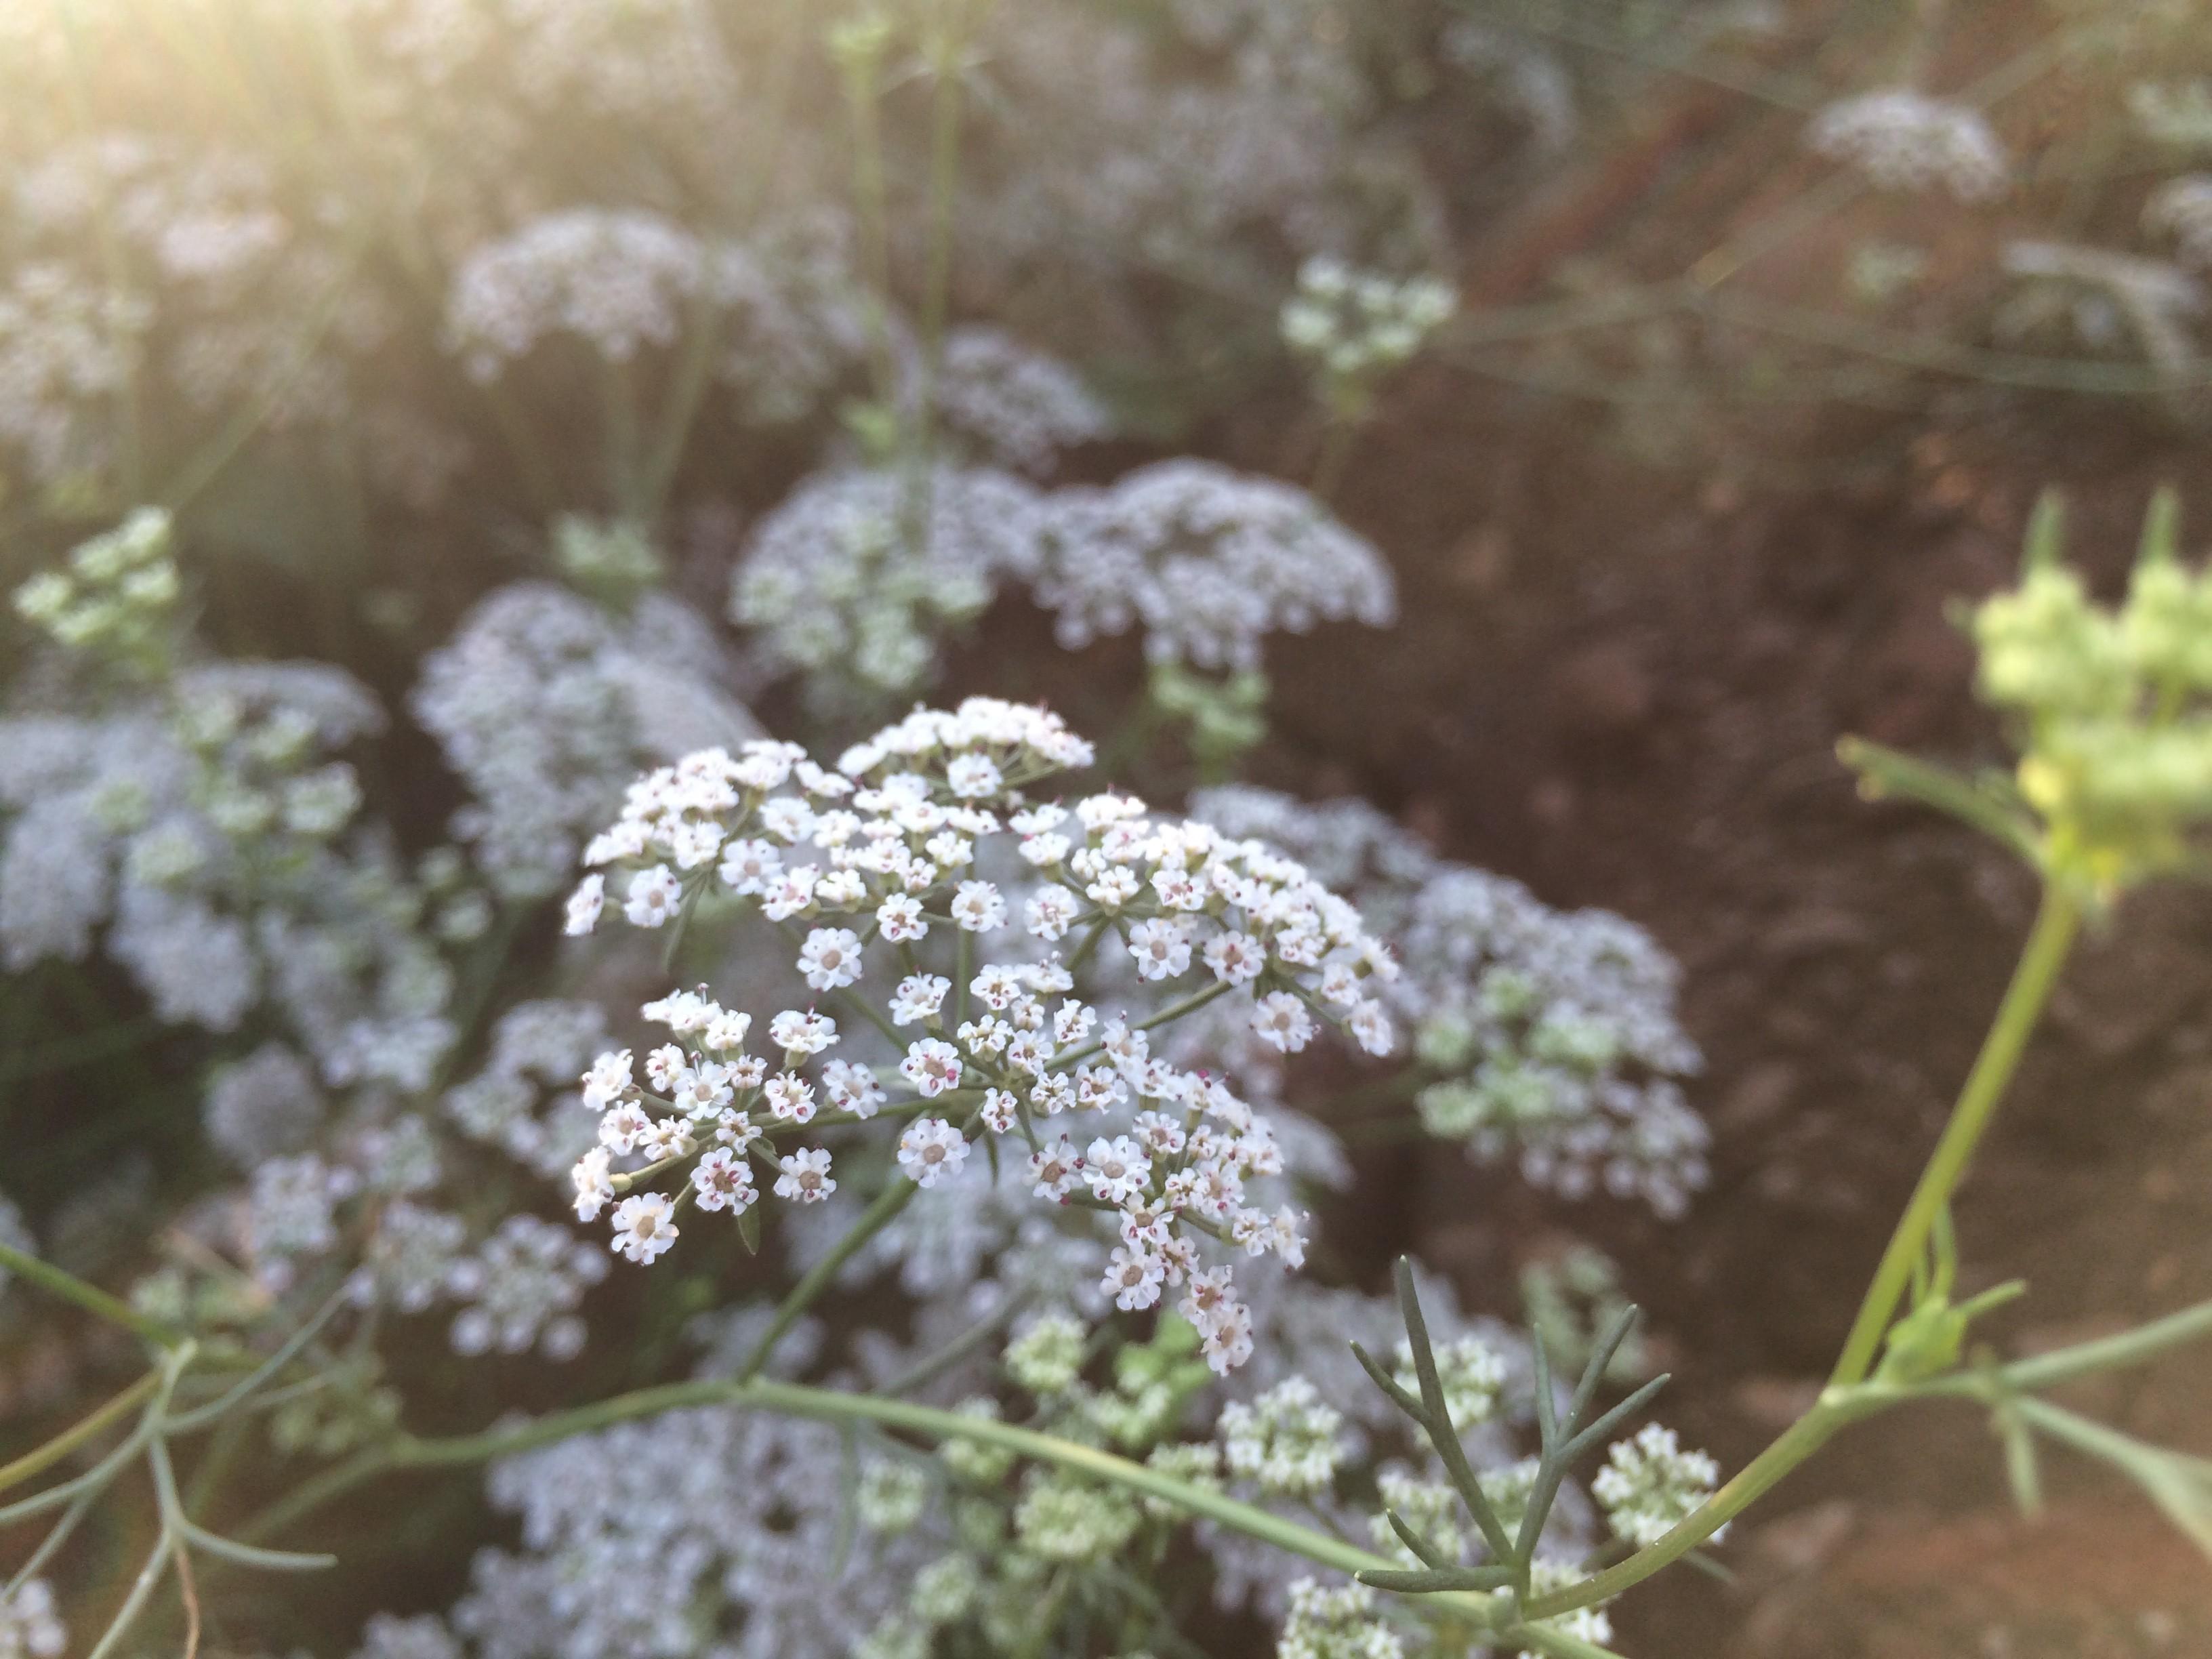 Fondos De Pantalla Paisaje Naturaleza Rama Flores Blancas